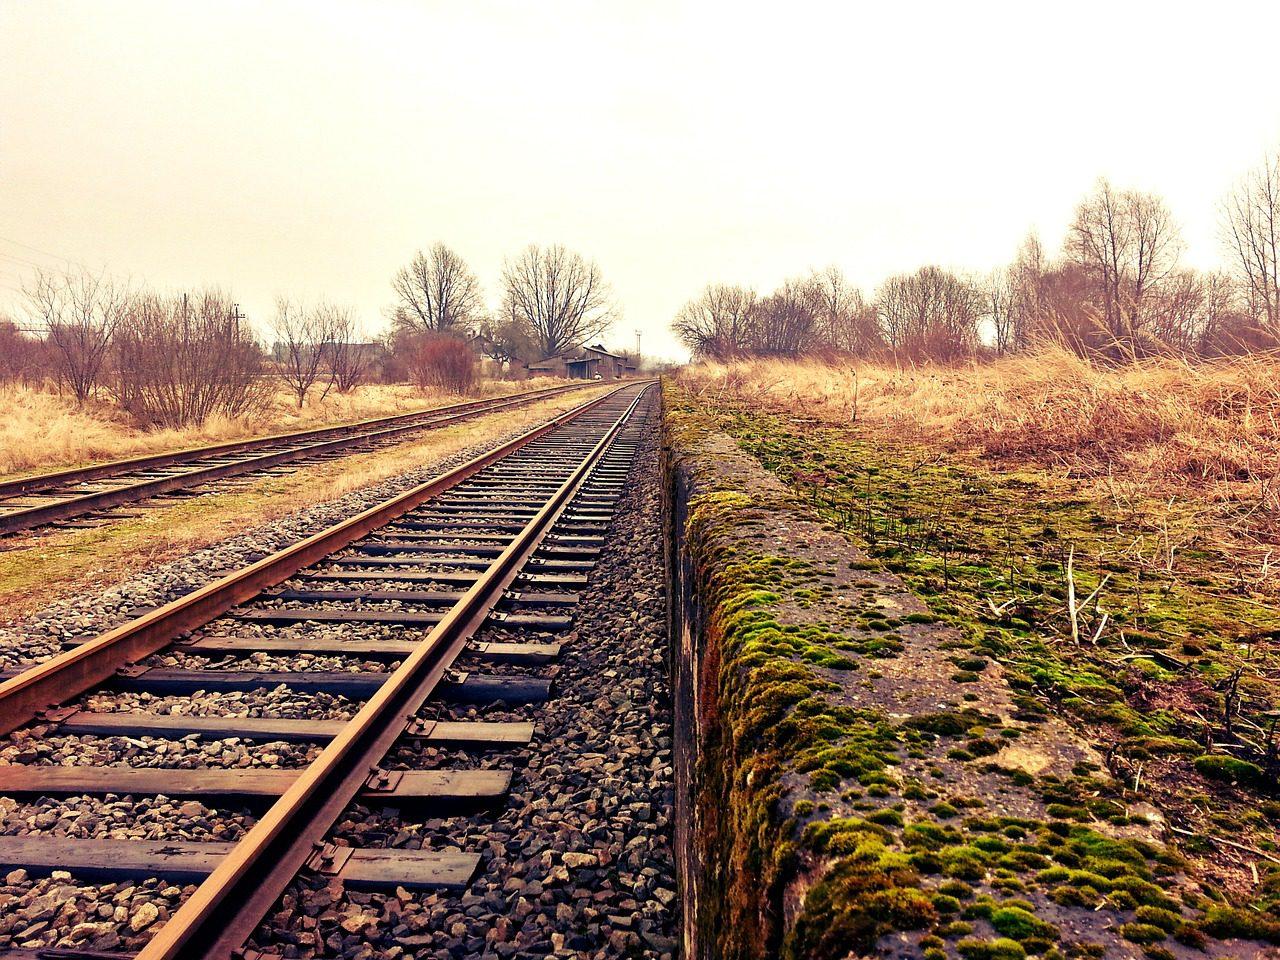 Rail Track Maintenance Worker